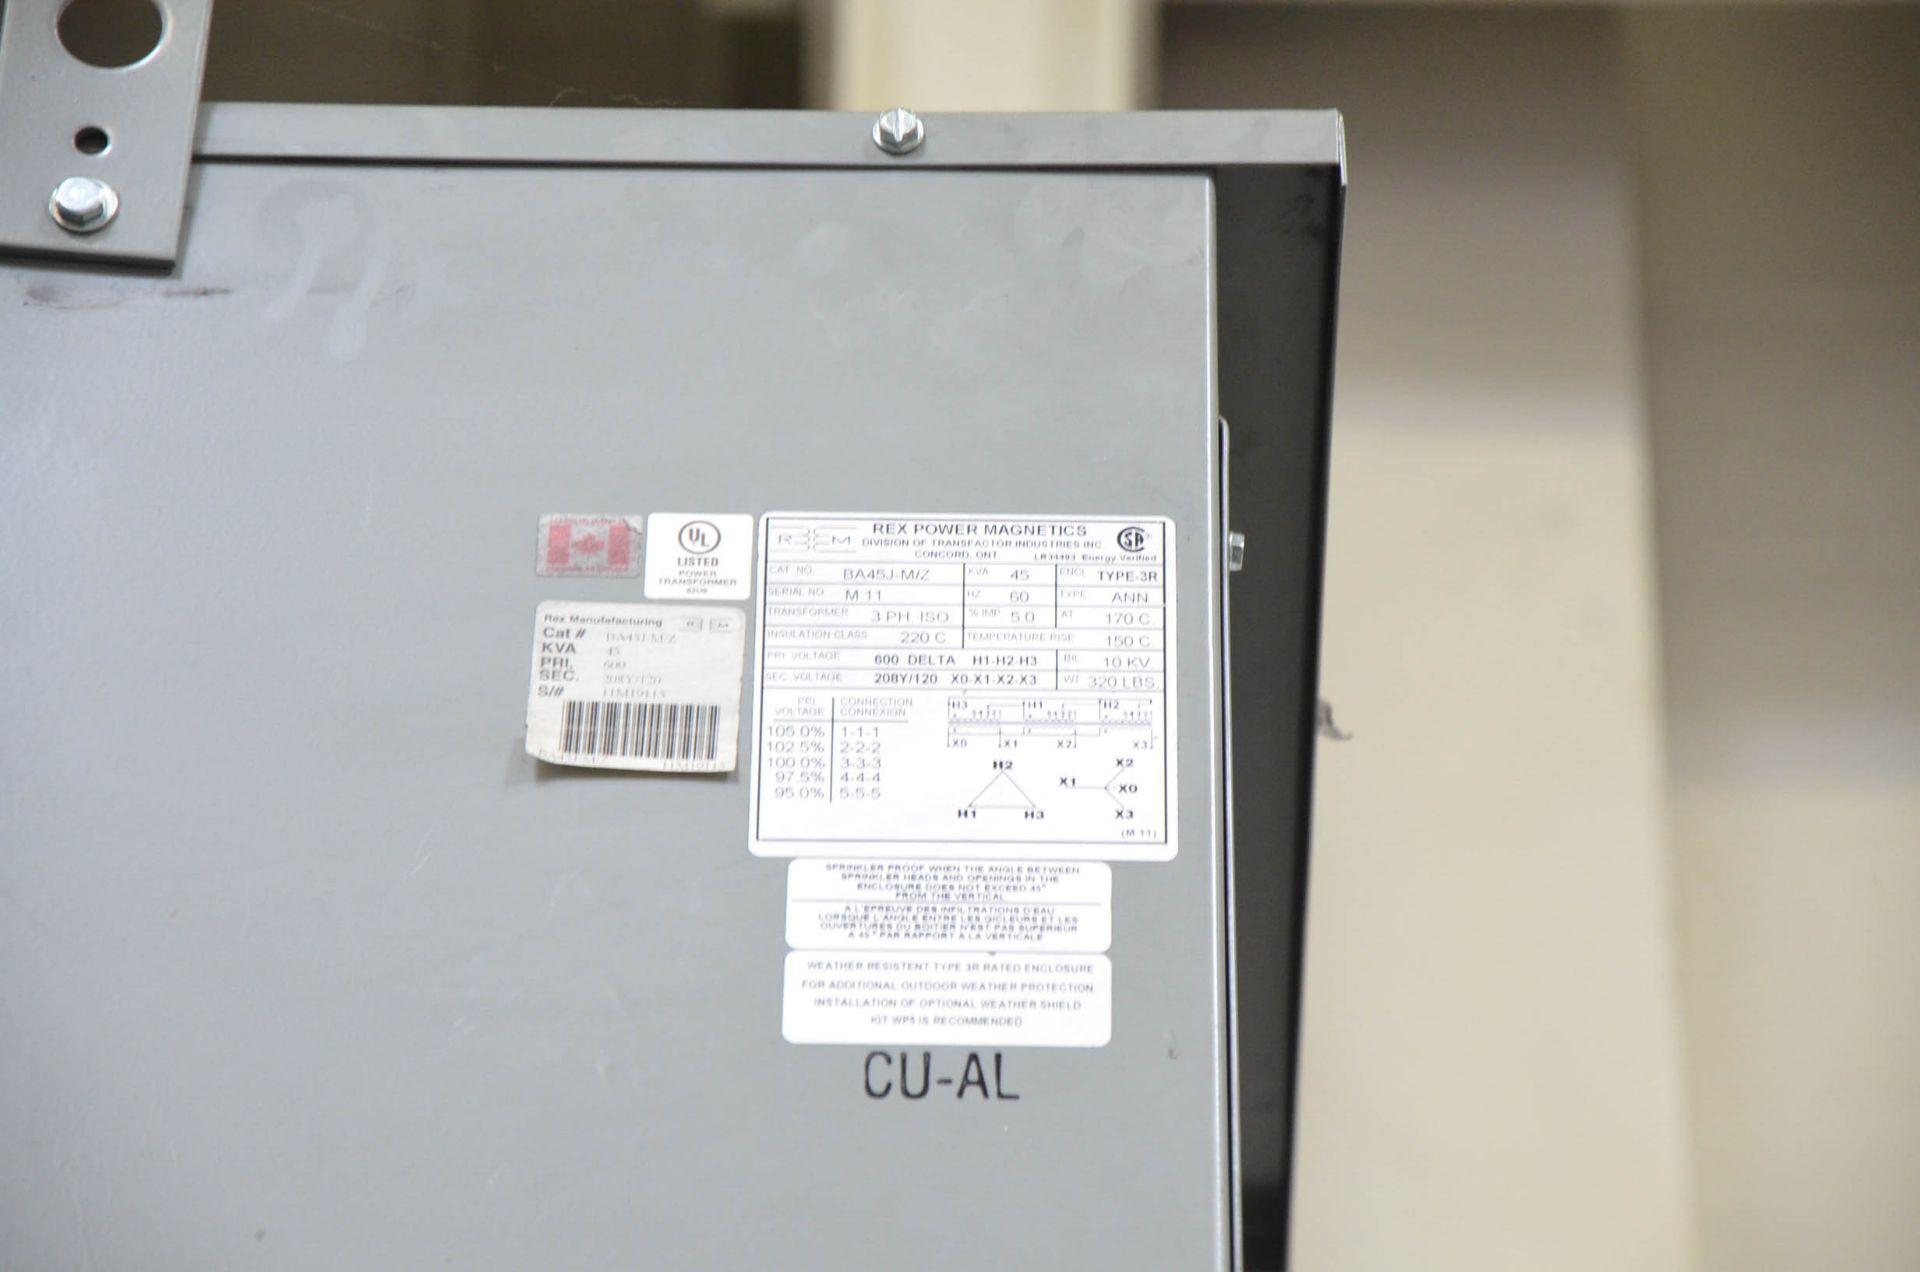 REX 45KVA/600-208-120V/3PH/60HZ TRANSFORMER (CI) [RIGGING FEES FOR LOT #138 - $50 USD PLUS - Image 2 of 2